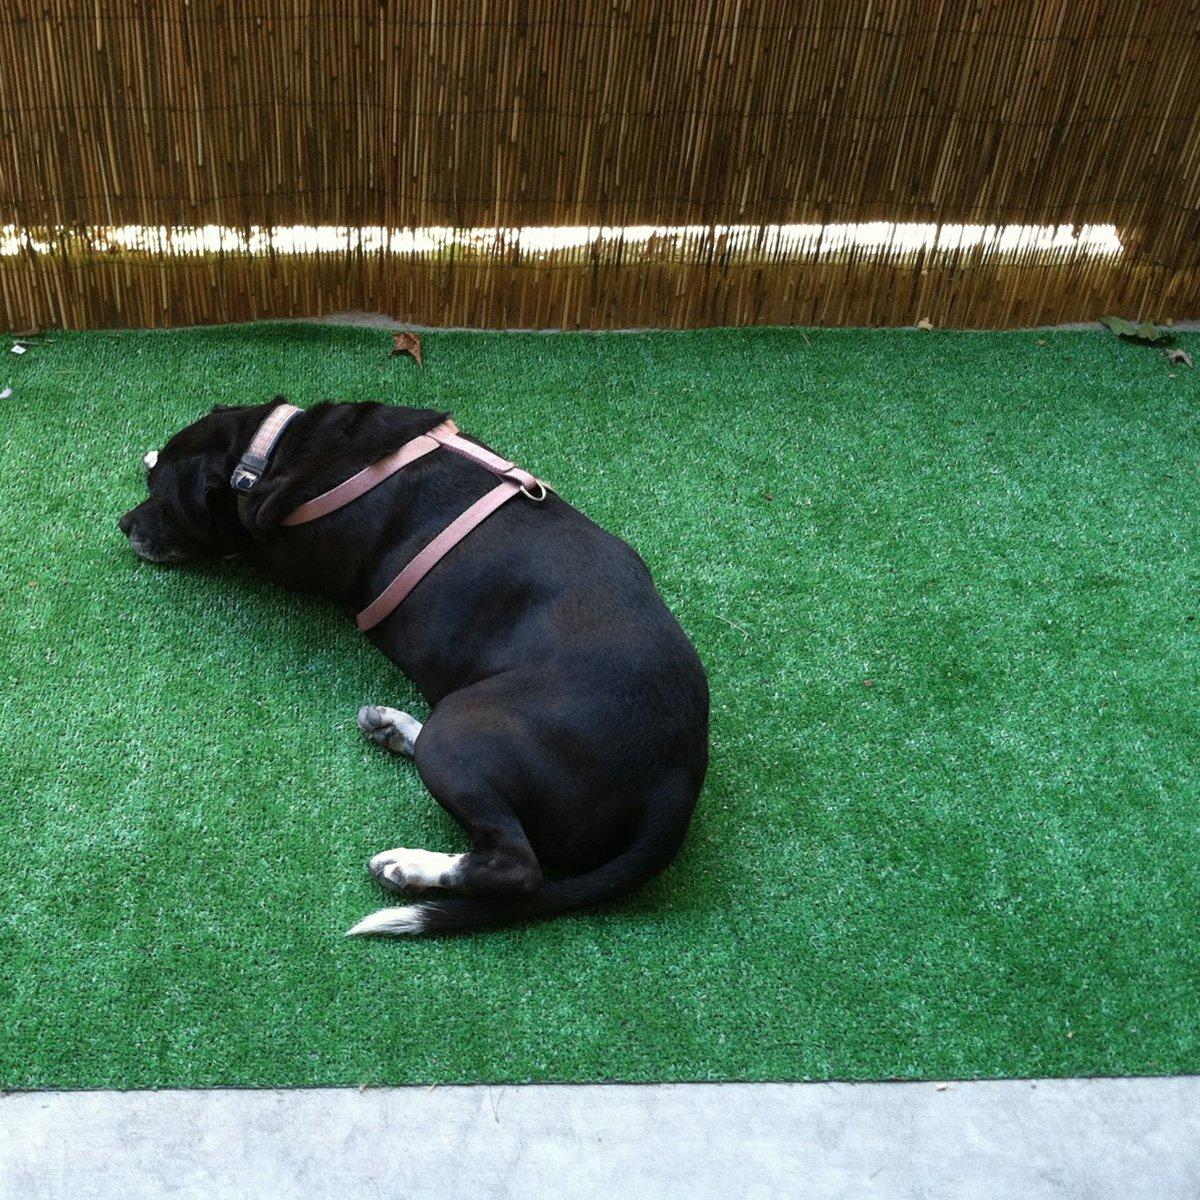 Amazon.com: Synturfmats Green Artificial Grass Carpet Rug - Indoor ...